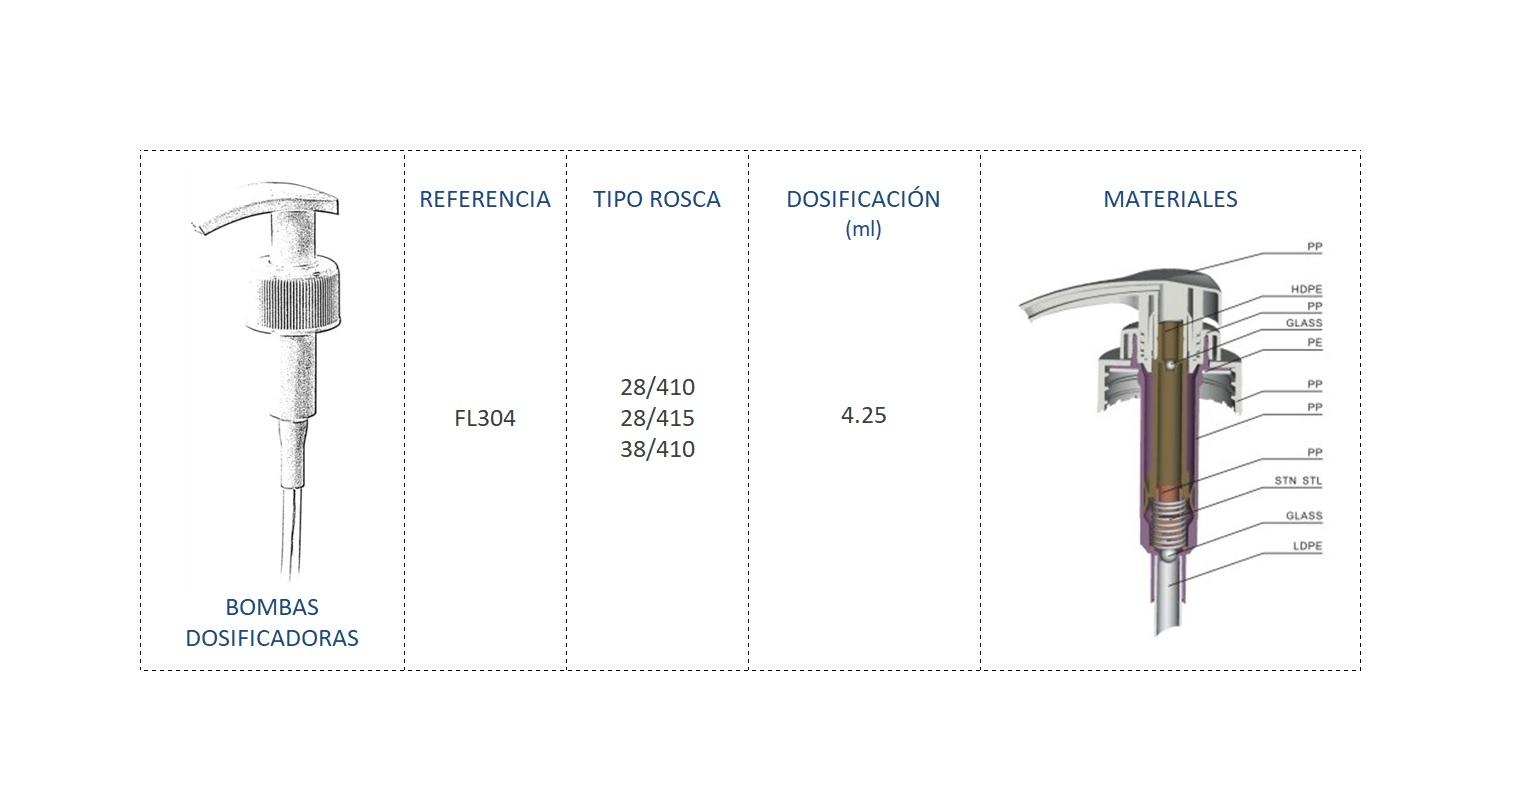 Cuadro de materiales bomba dosificadora FL304